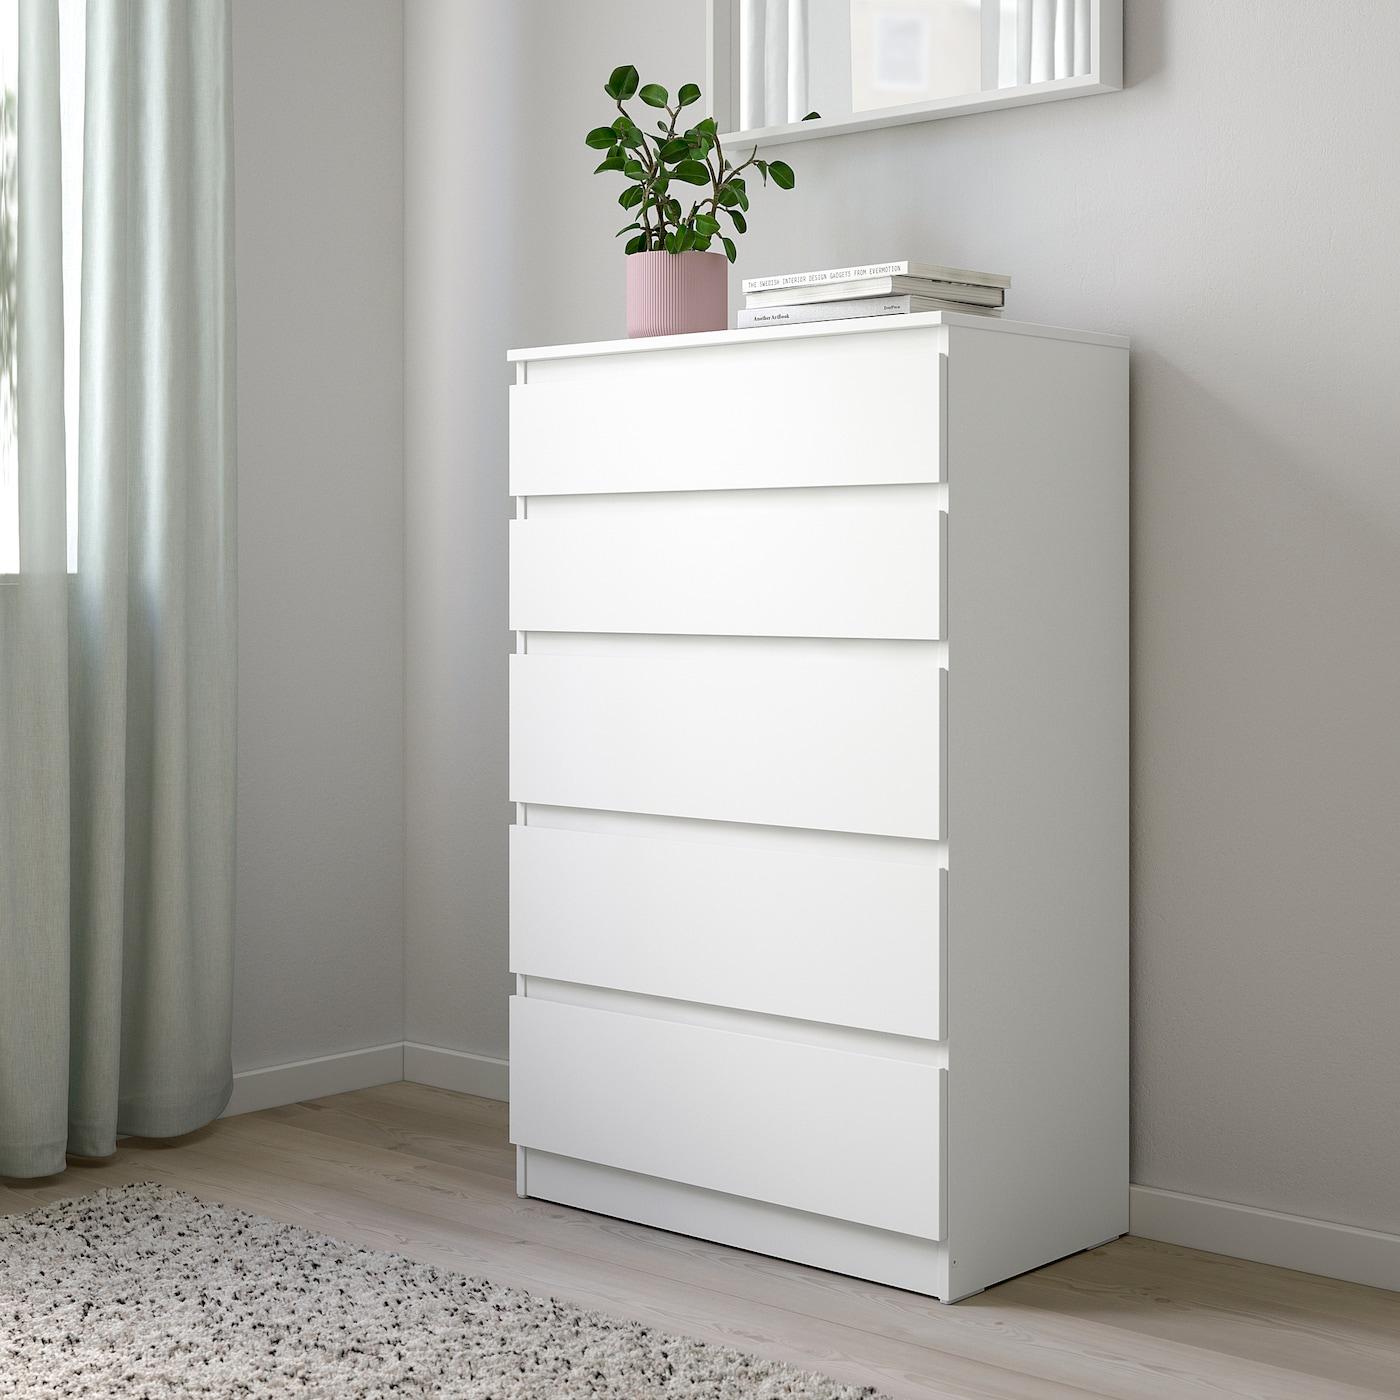 Kullen White Chest Of 5 Drawers 70x112 Cm Ikea